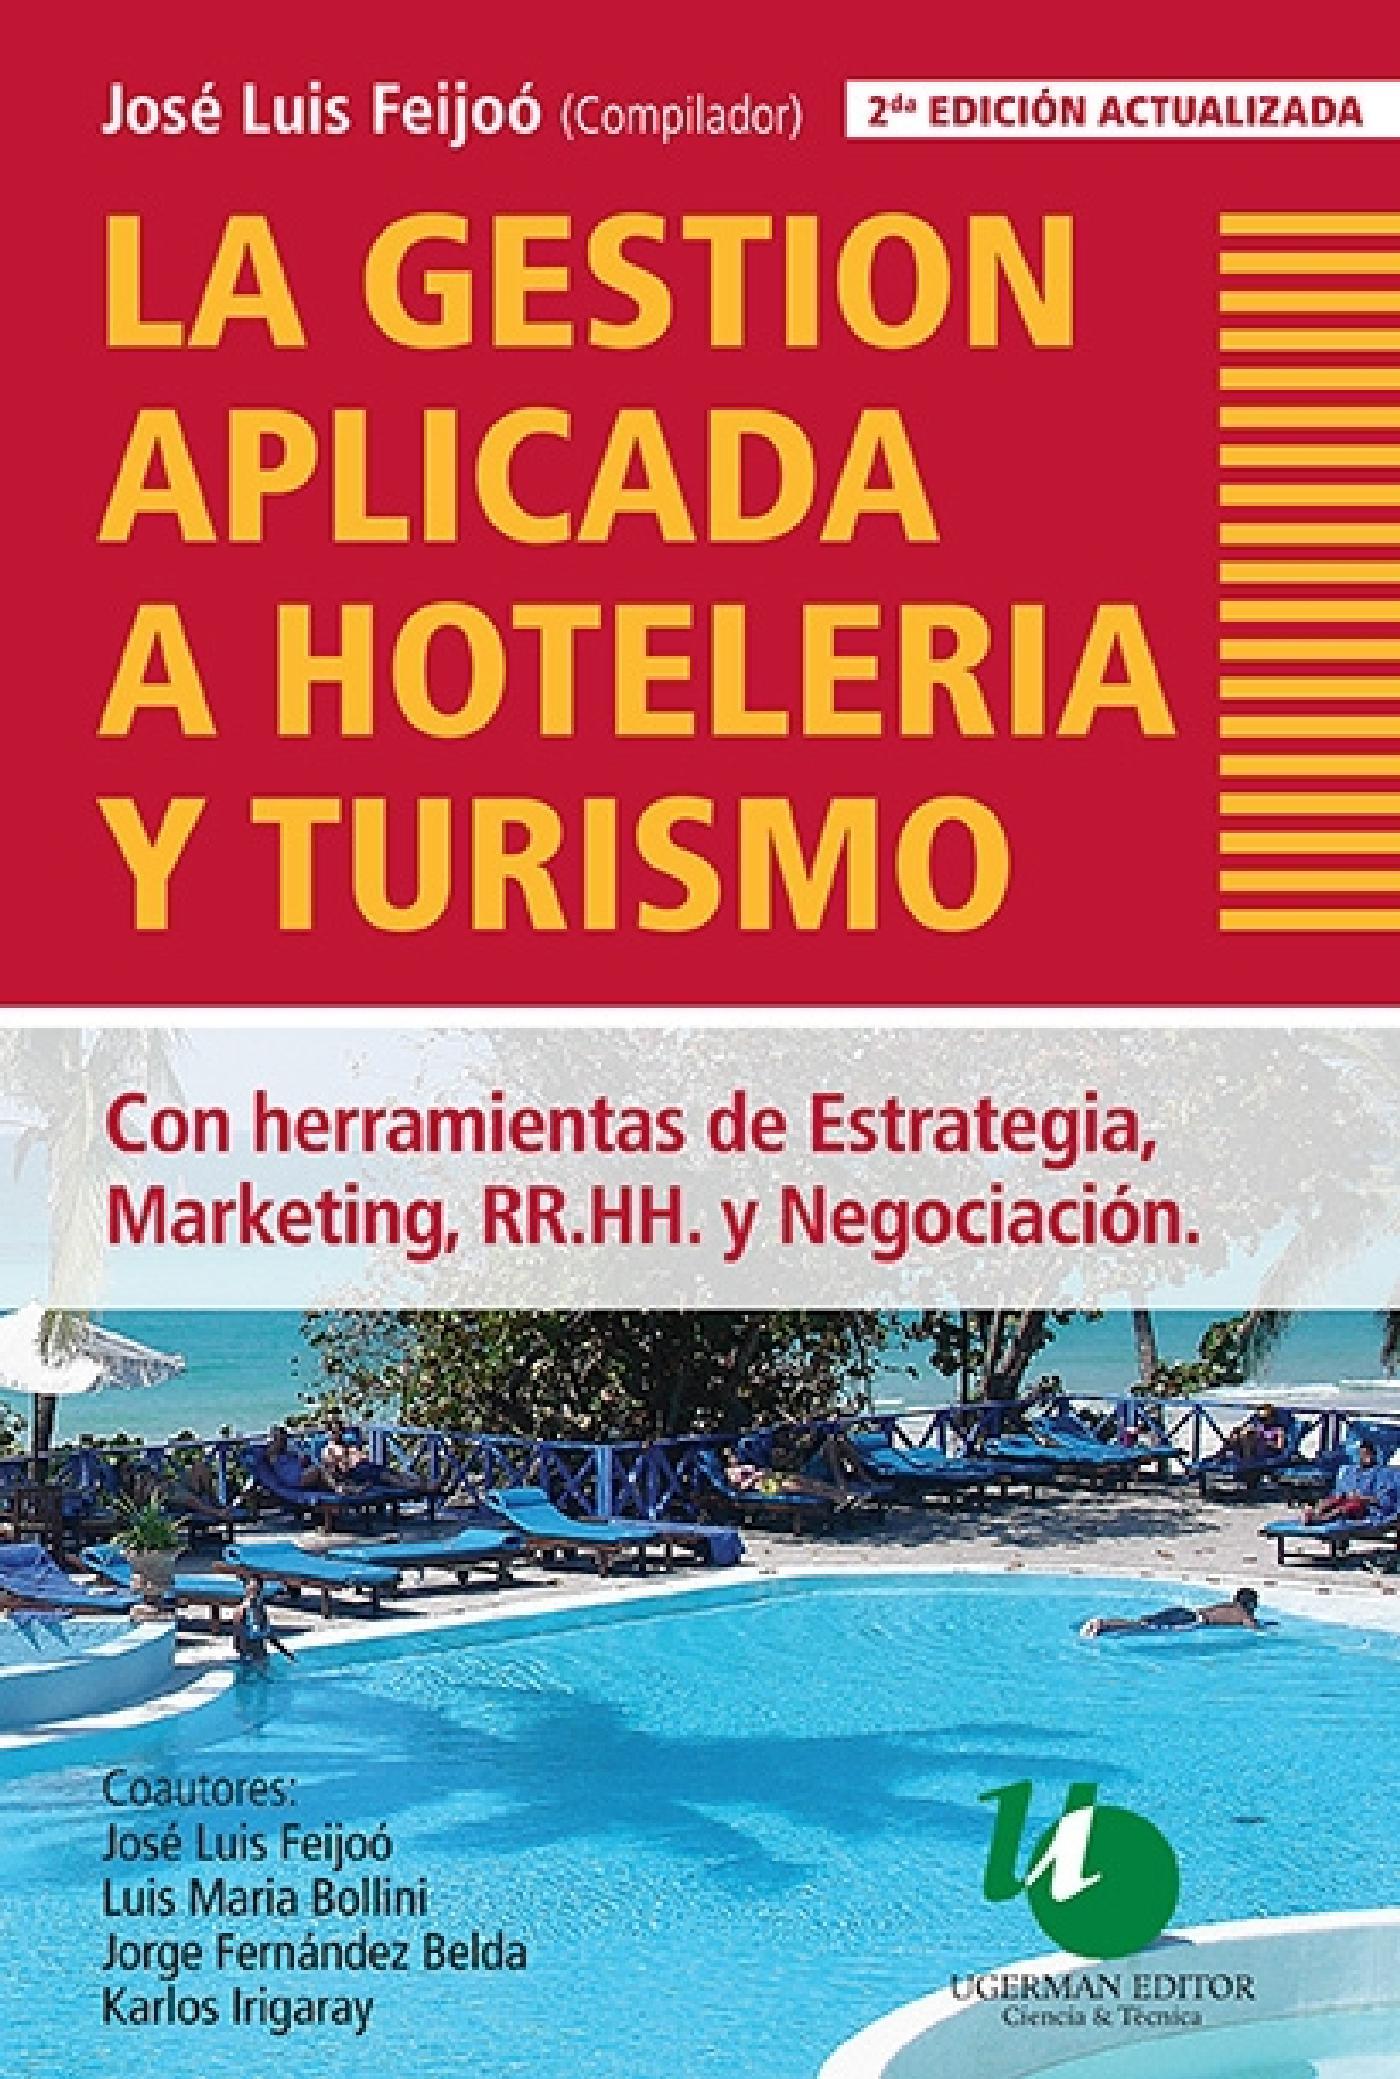 LIBROS DE HOTELERIA EBOOK